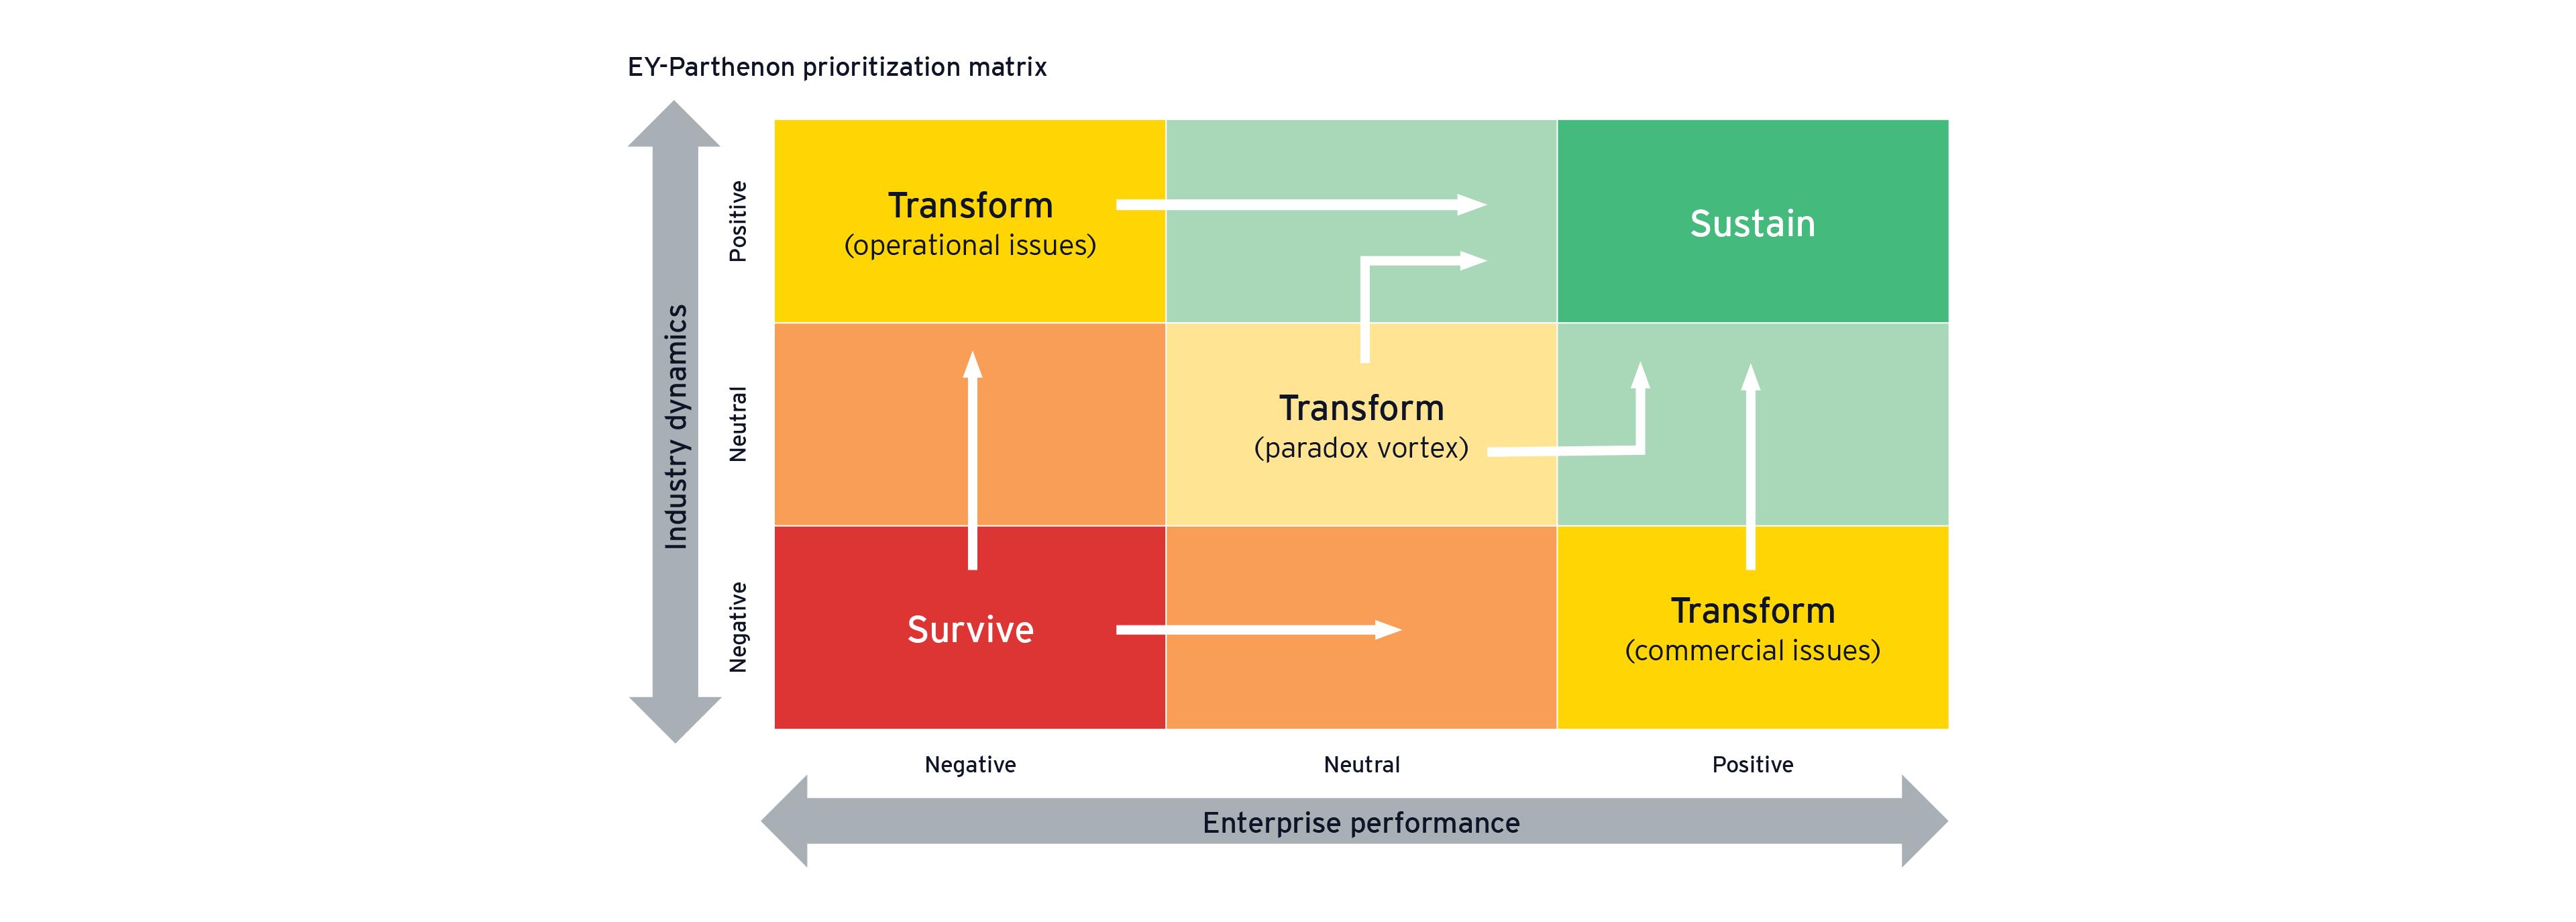 EY-Parthenon prioritization matrix